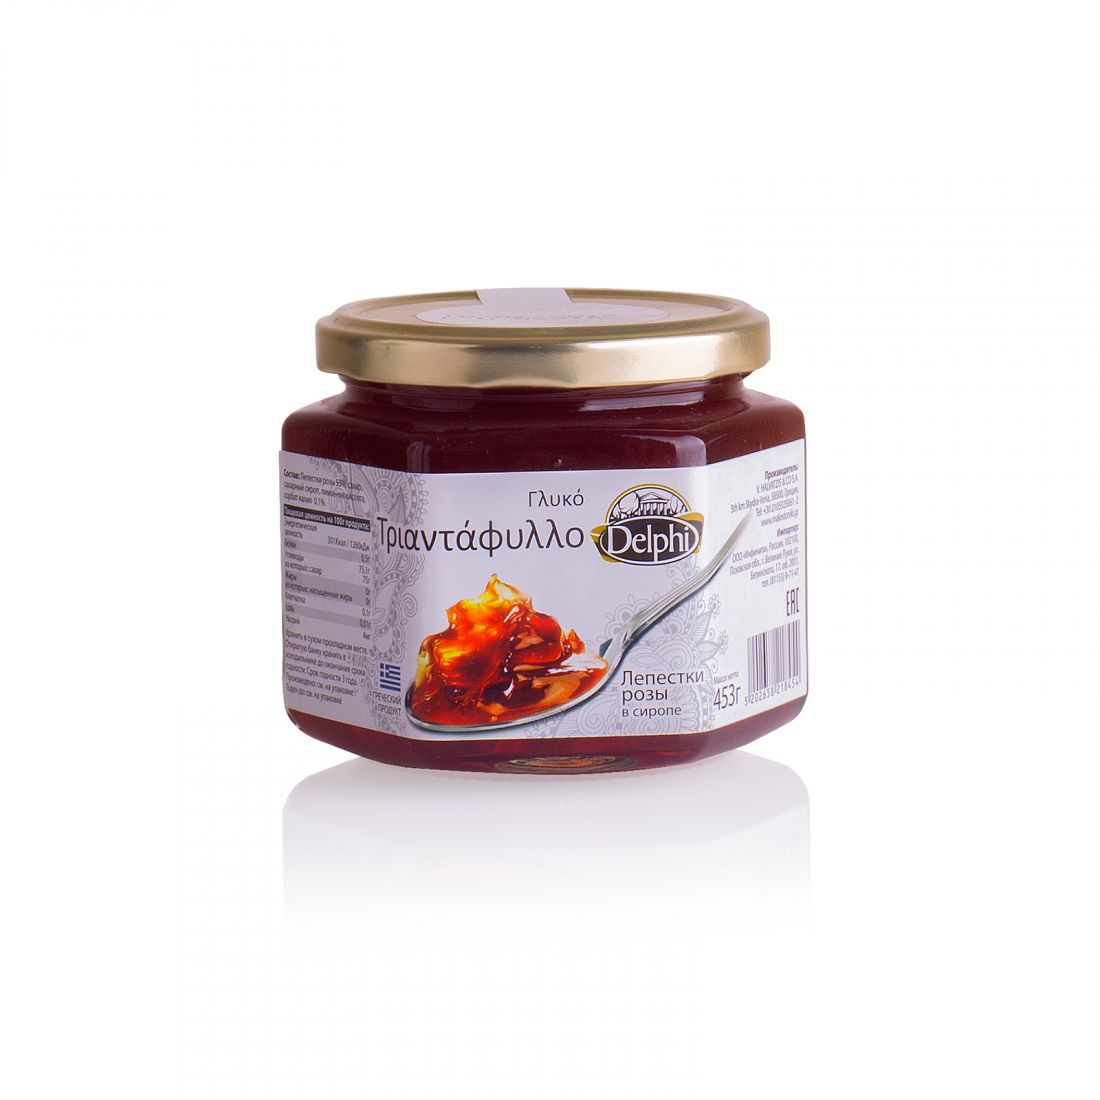 Лепестки розы в сиропе Delphi - 453 гр